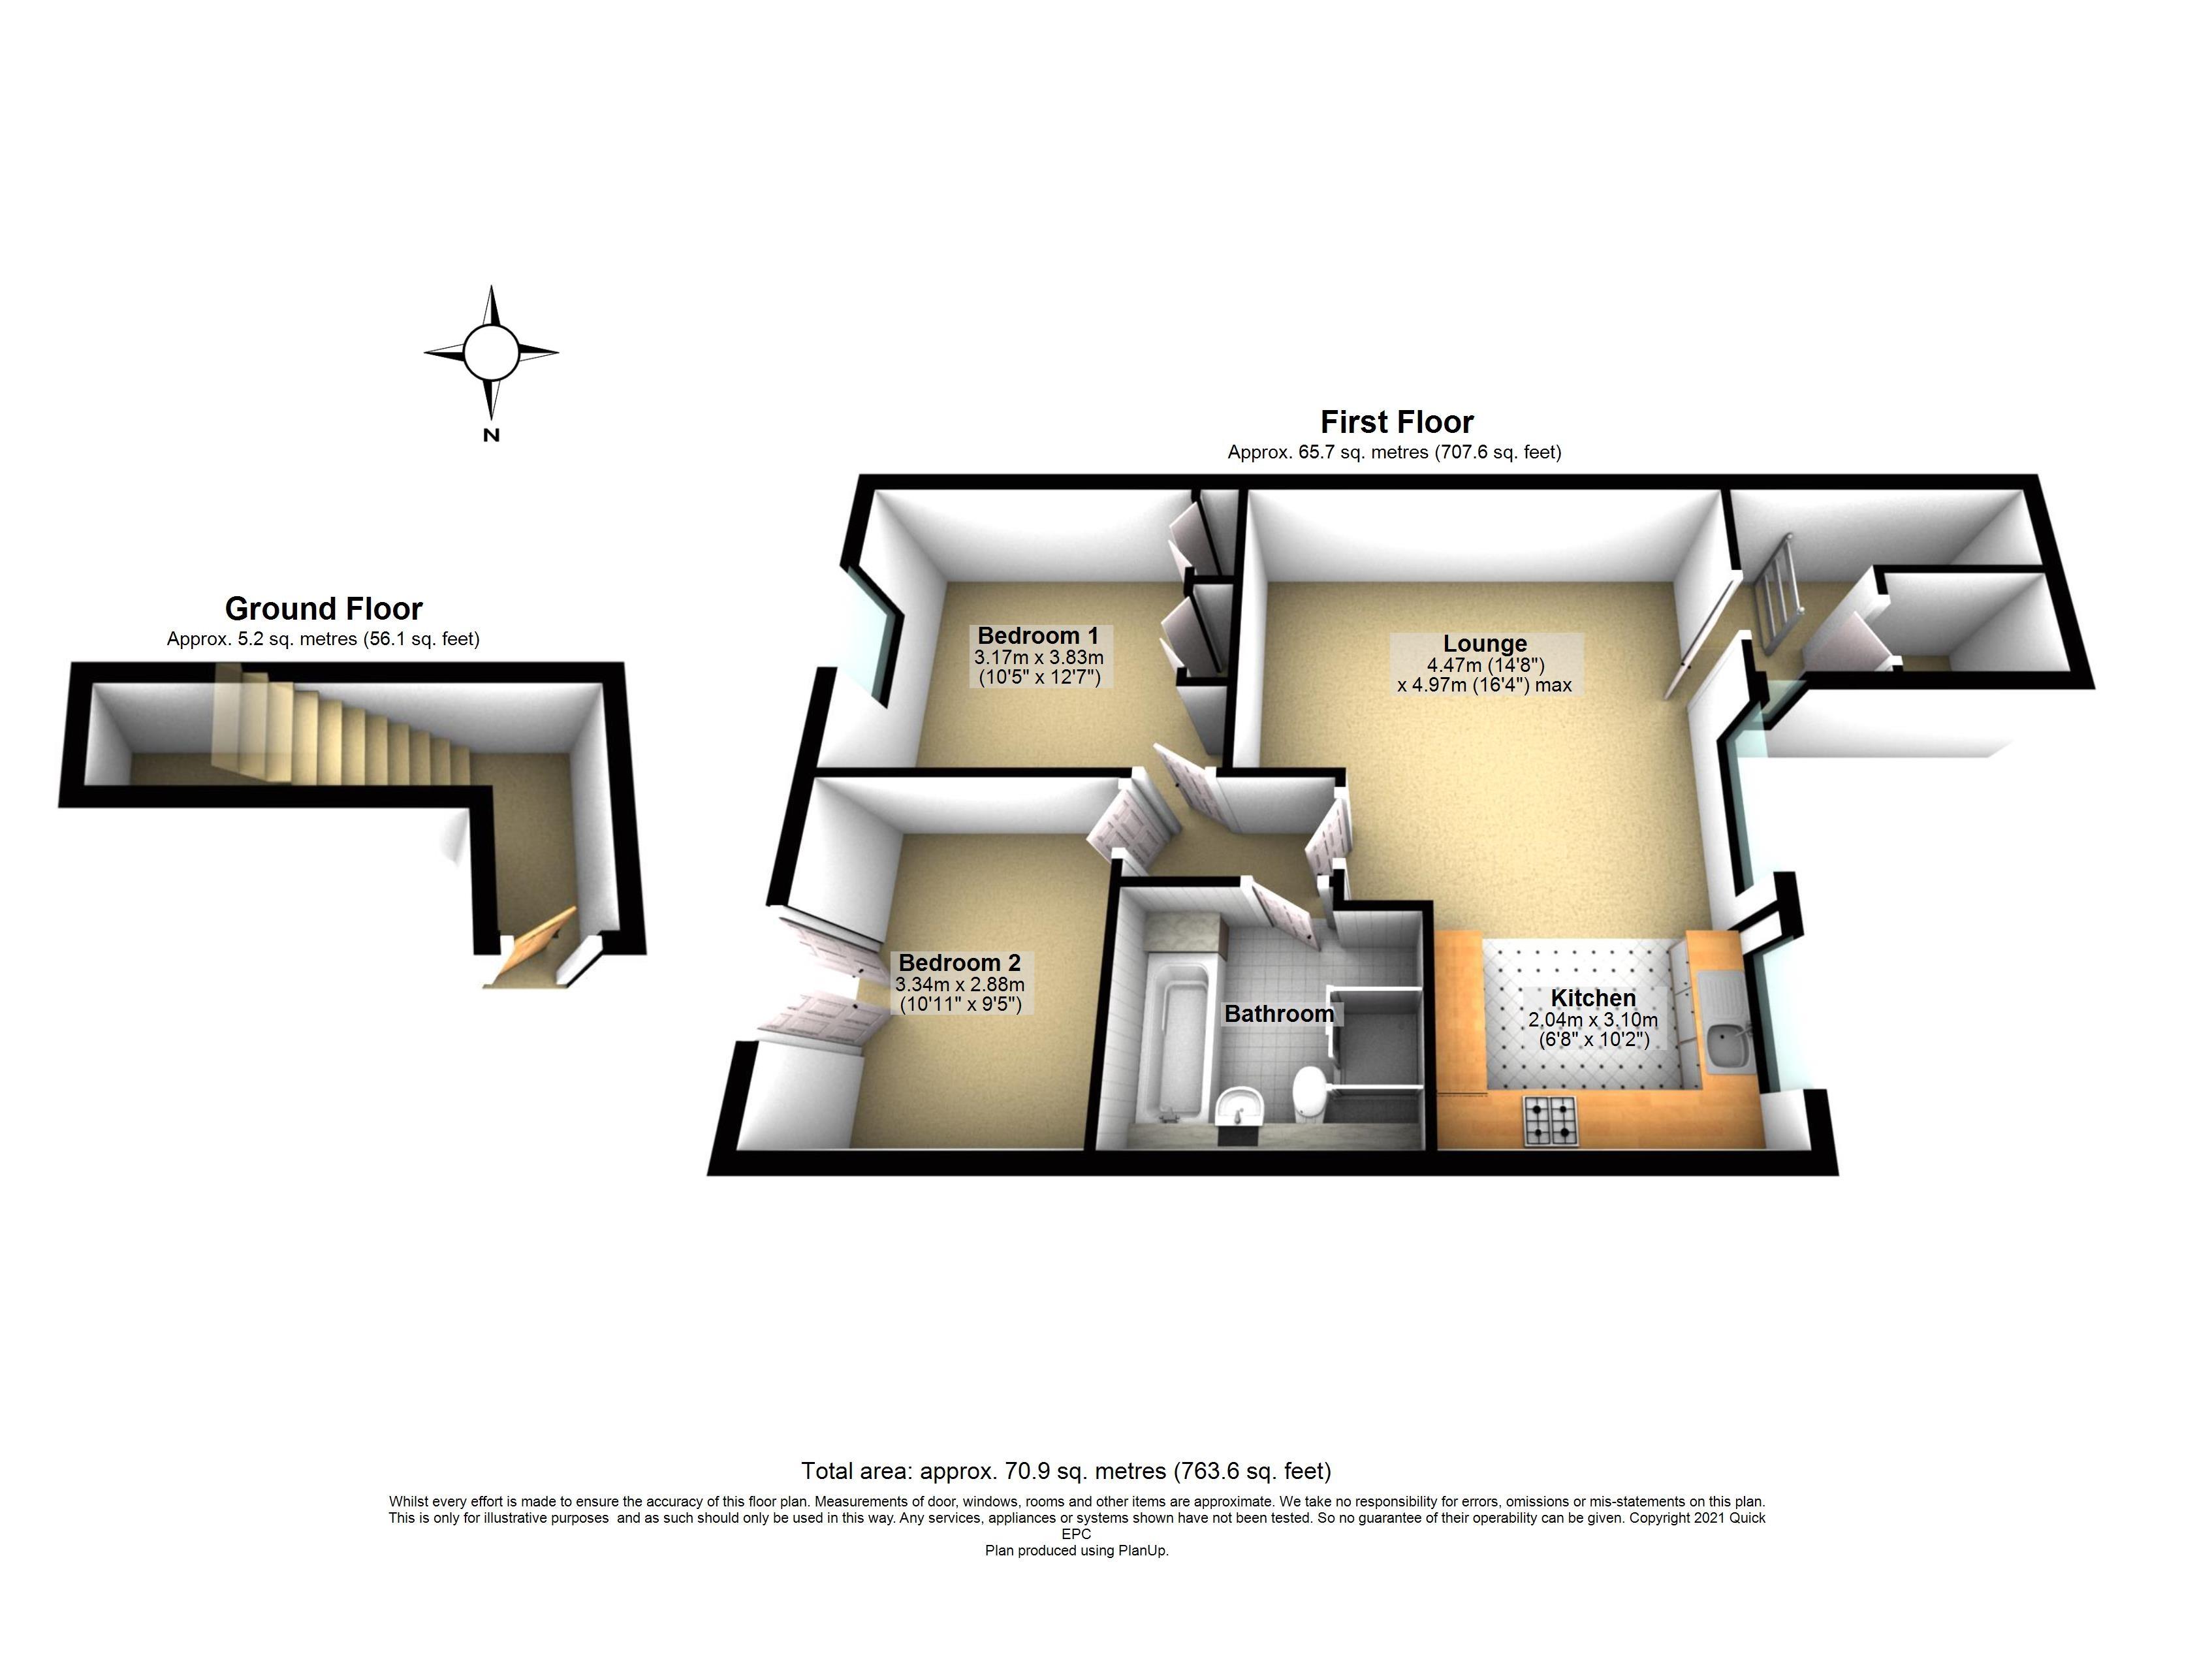 9 Jackson Close Floorplan